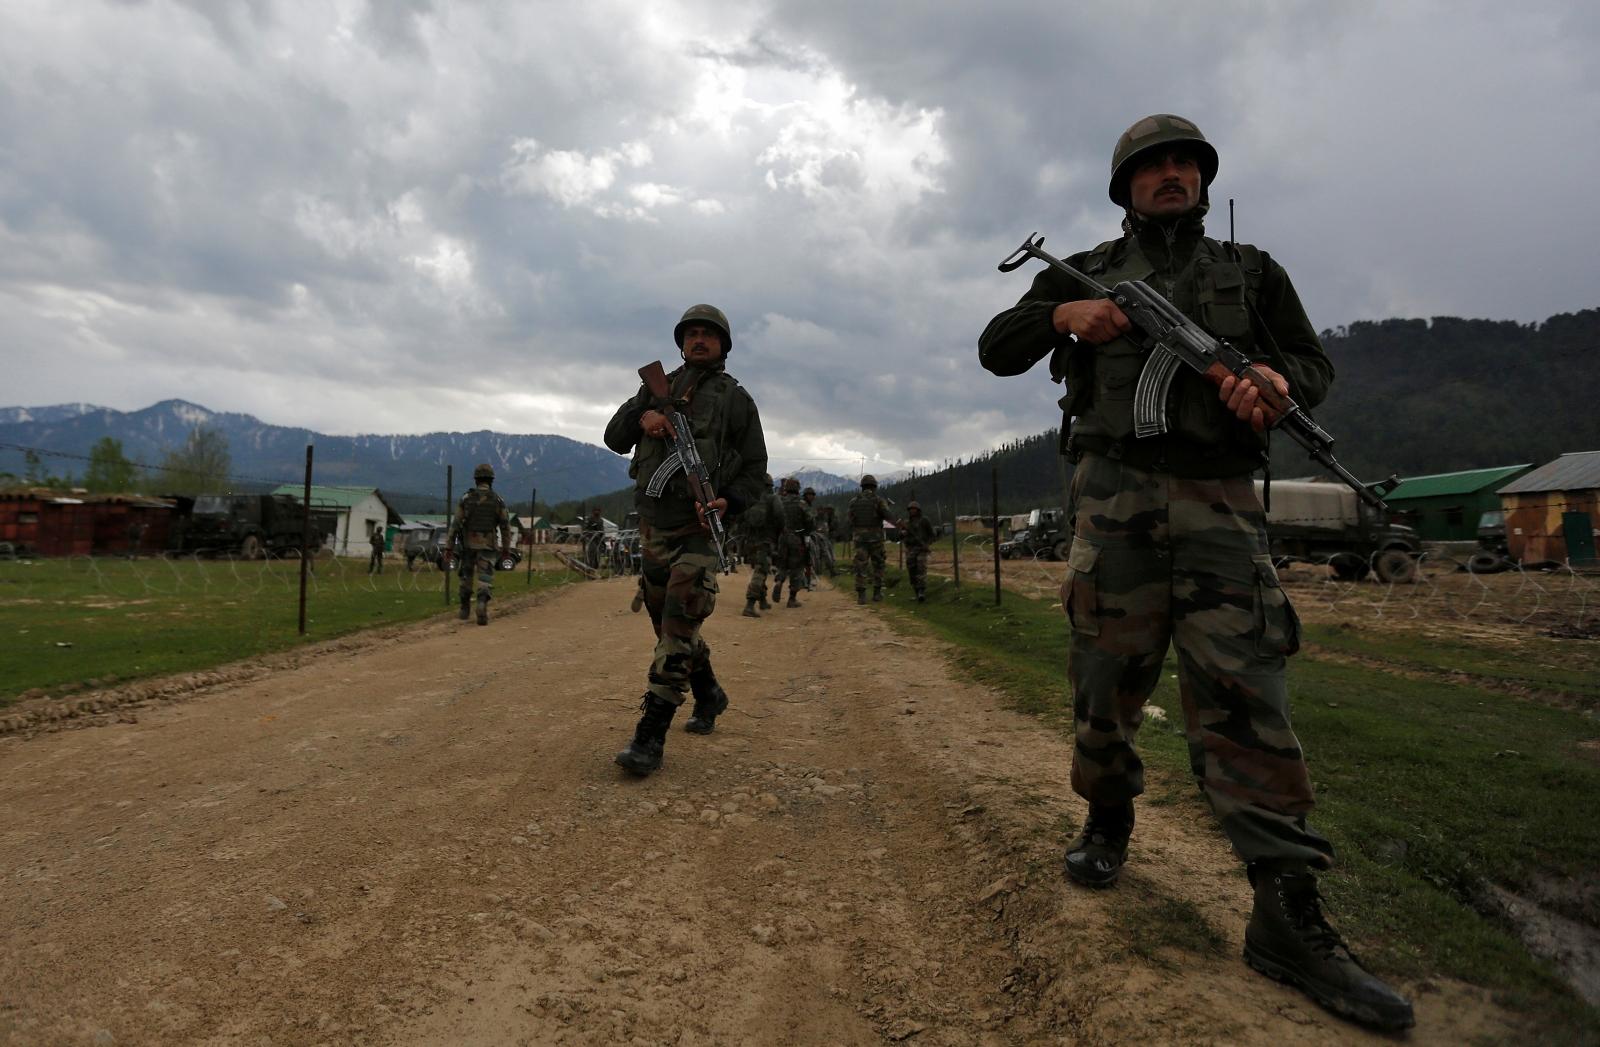 Indian soldiers beheaded Kashmir